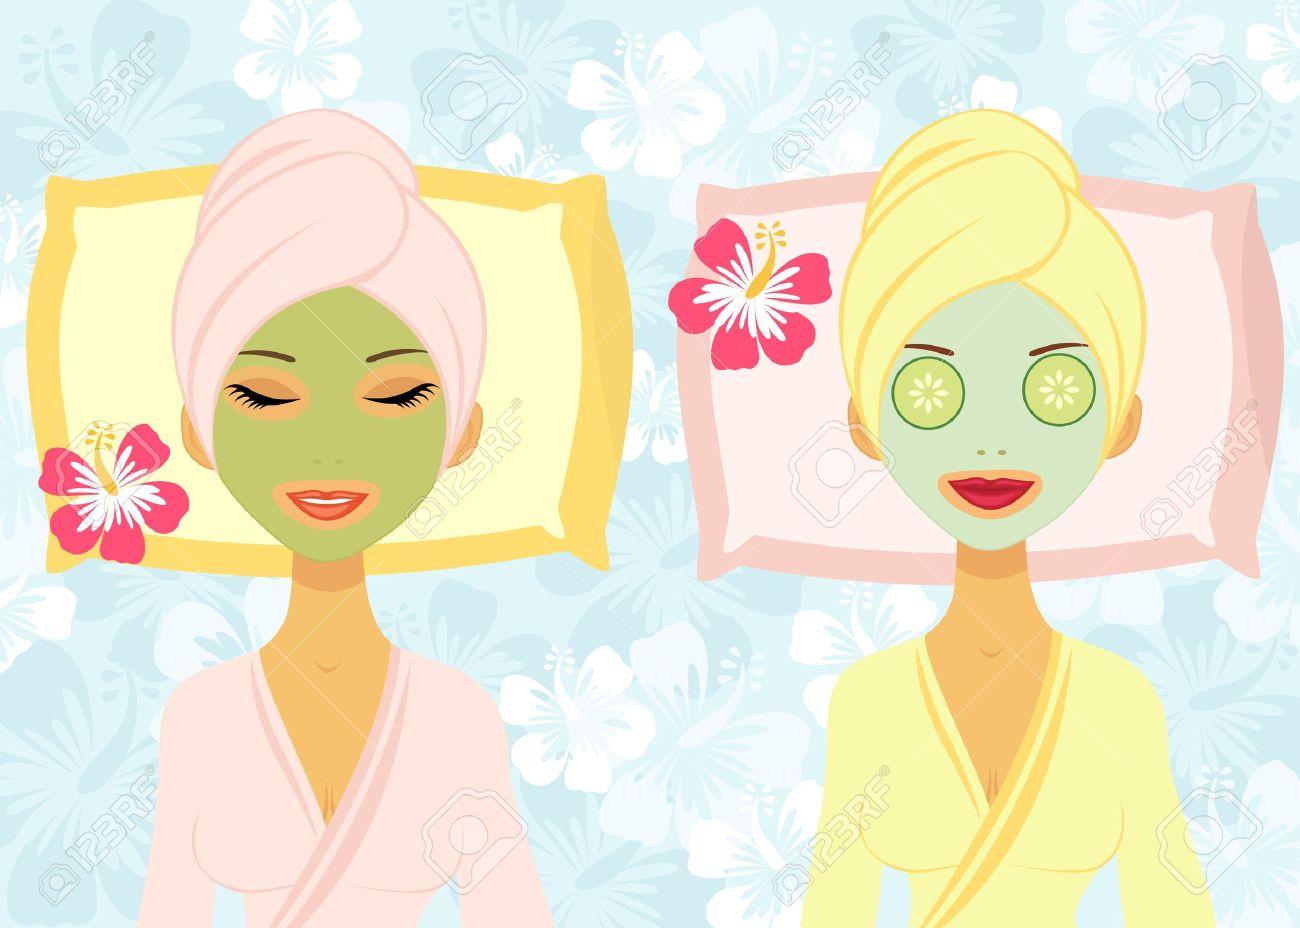 Beauty Treatment Royalty Free Cliparts, Vectors, And Stock.